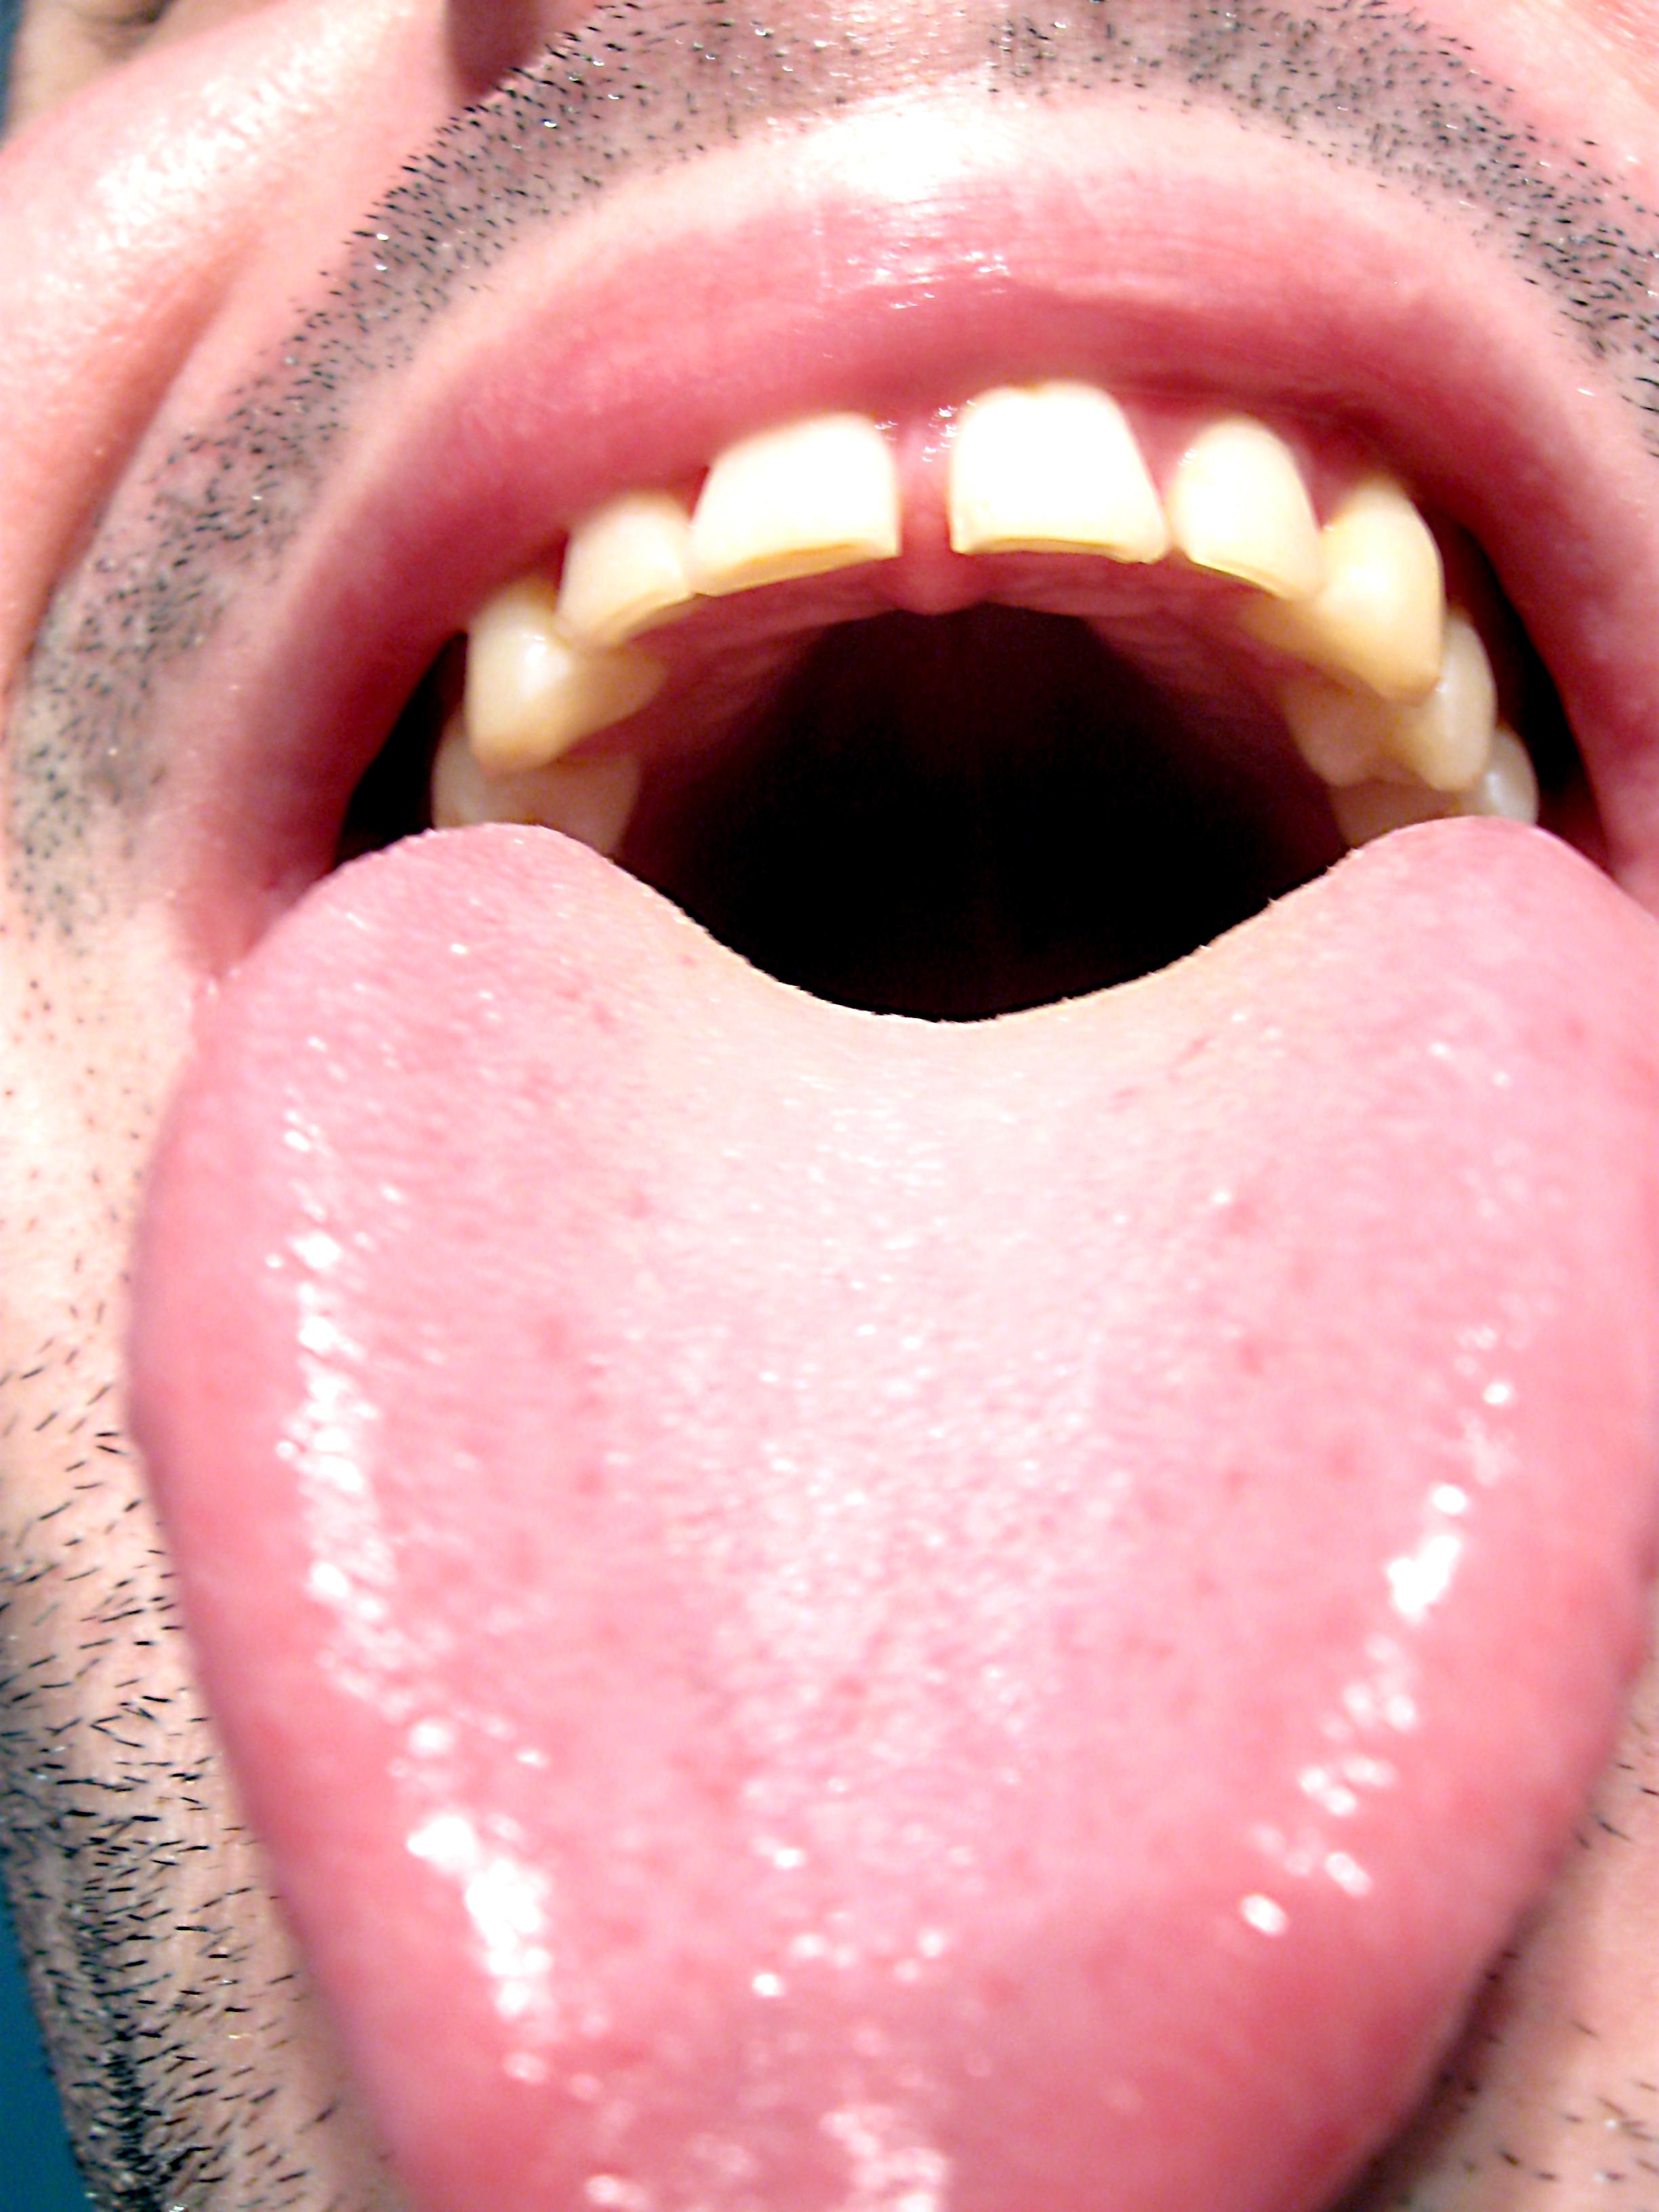 Tongue Discoloration